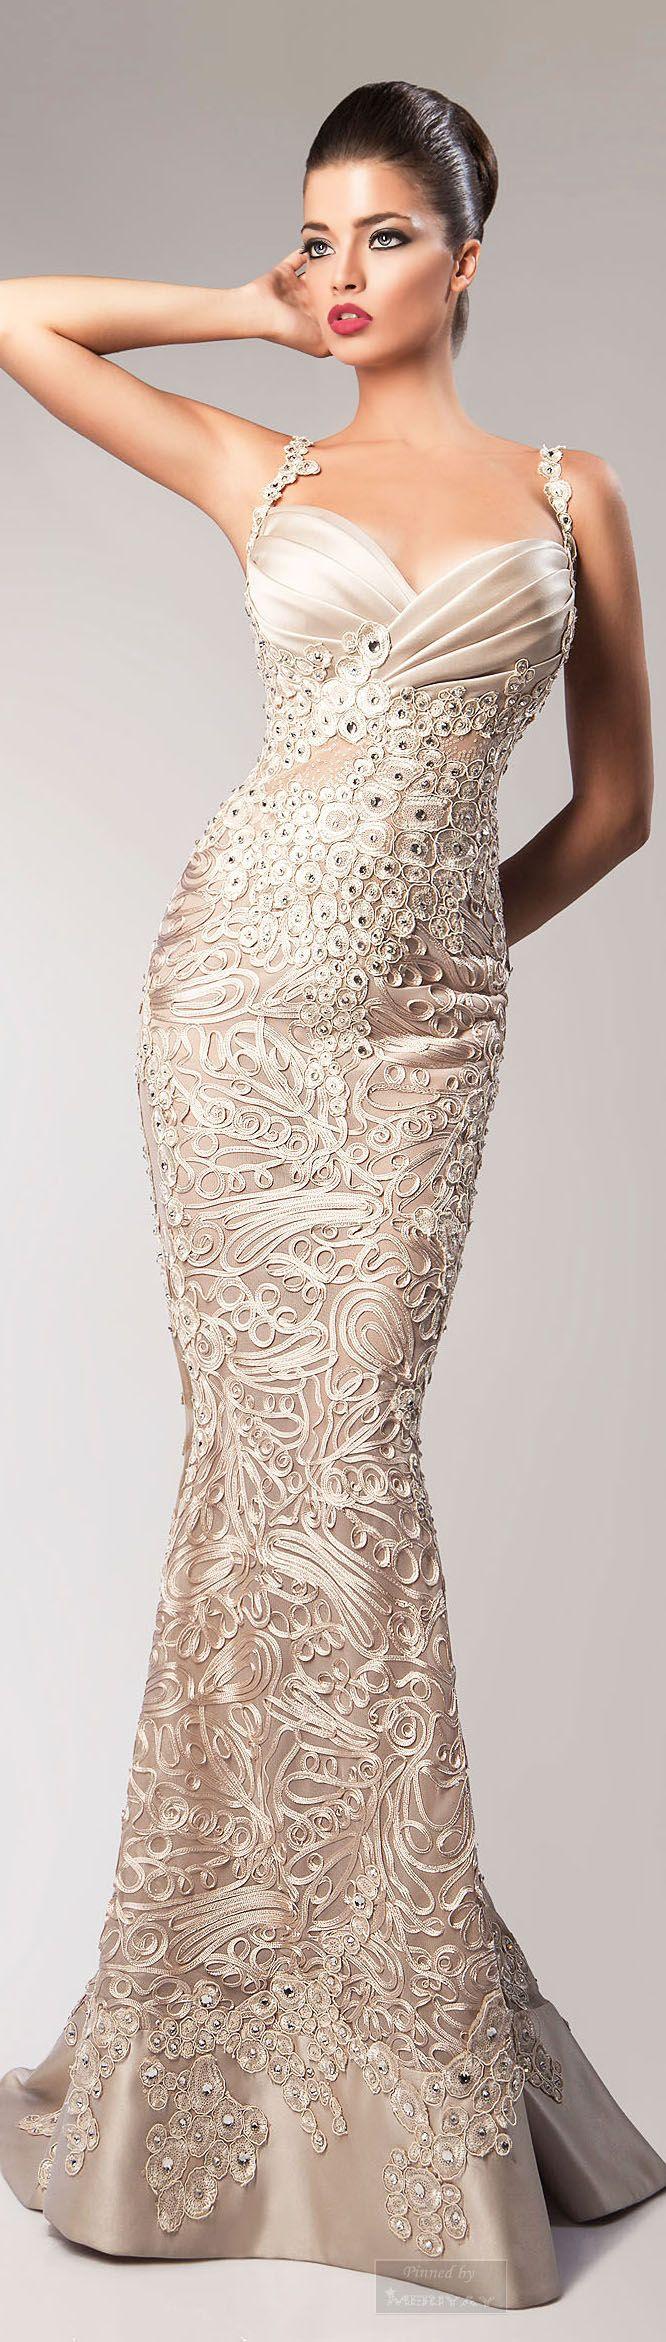 Latex wedding dress  Hanna Toumajean FW   Kрасота  Pinterest  Winter